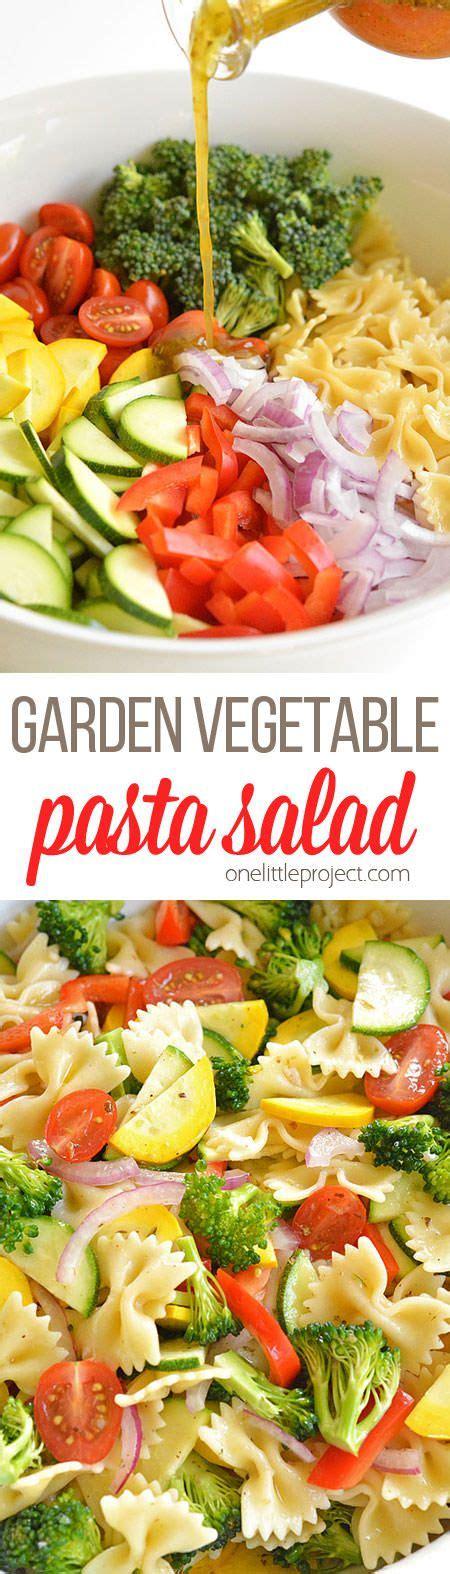 Garden Vegetable Pasta Salad Recipe Gardens Vegetables Garden Vegetable Pasta Salad